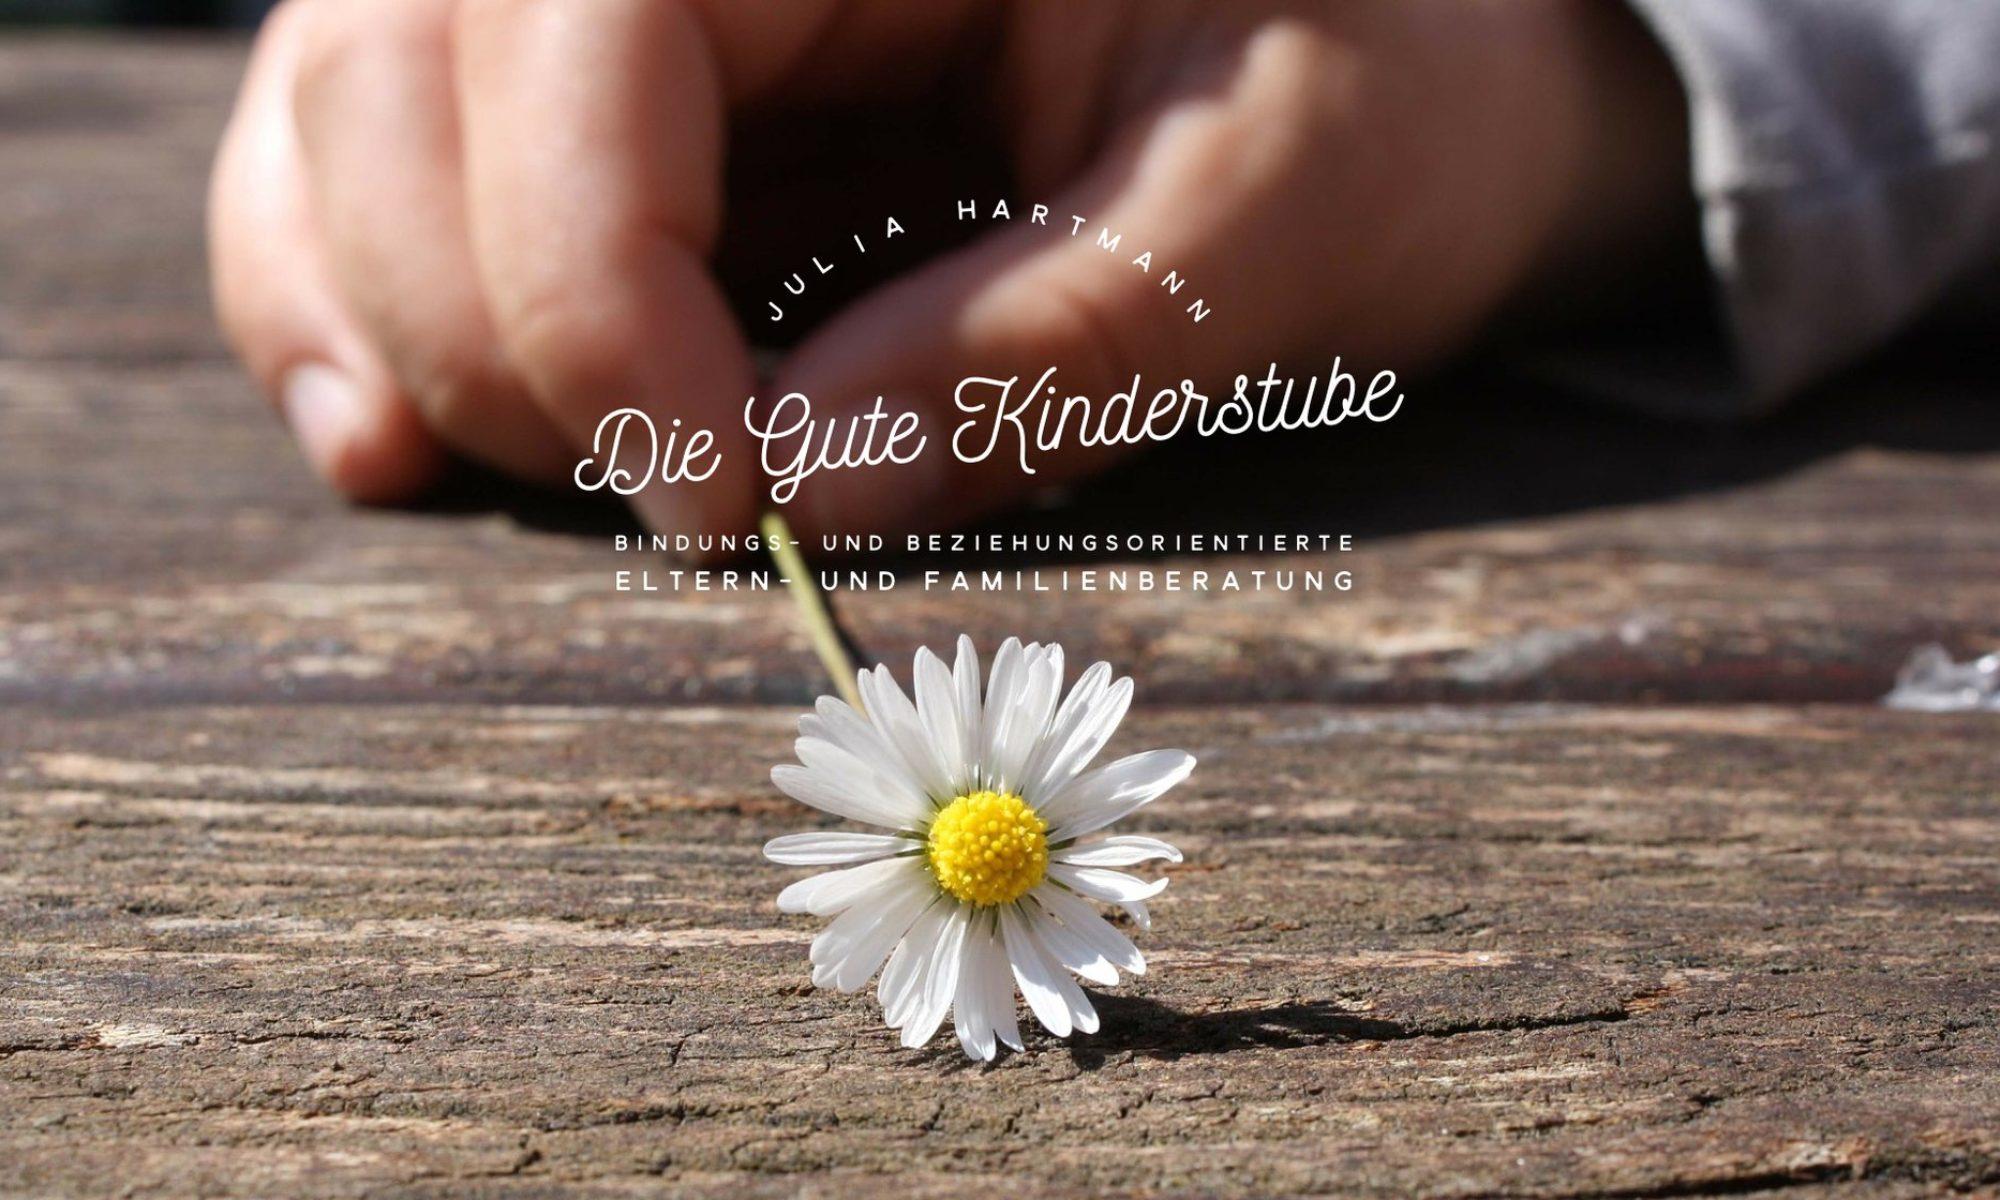 Julia Hartmann - Familienberatung